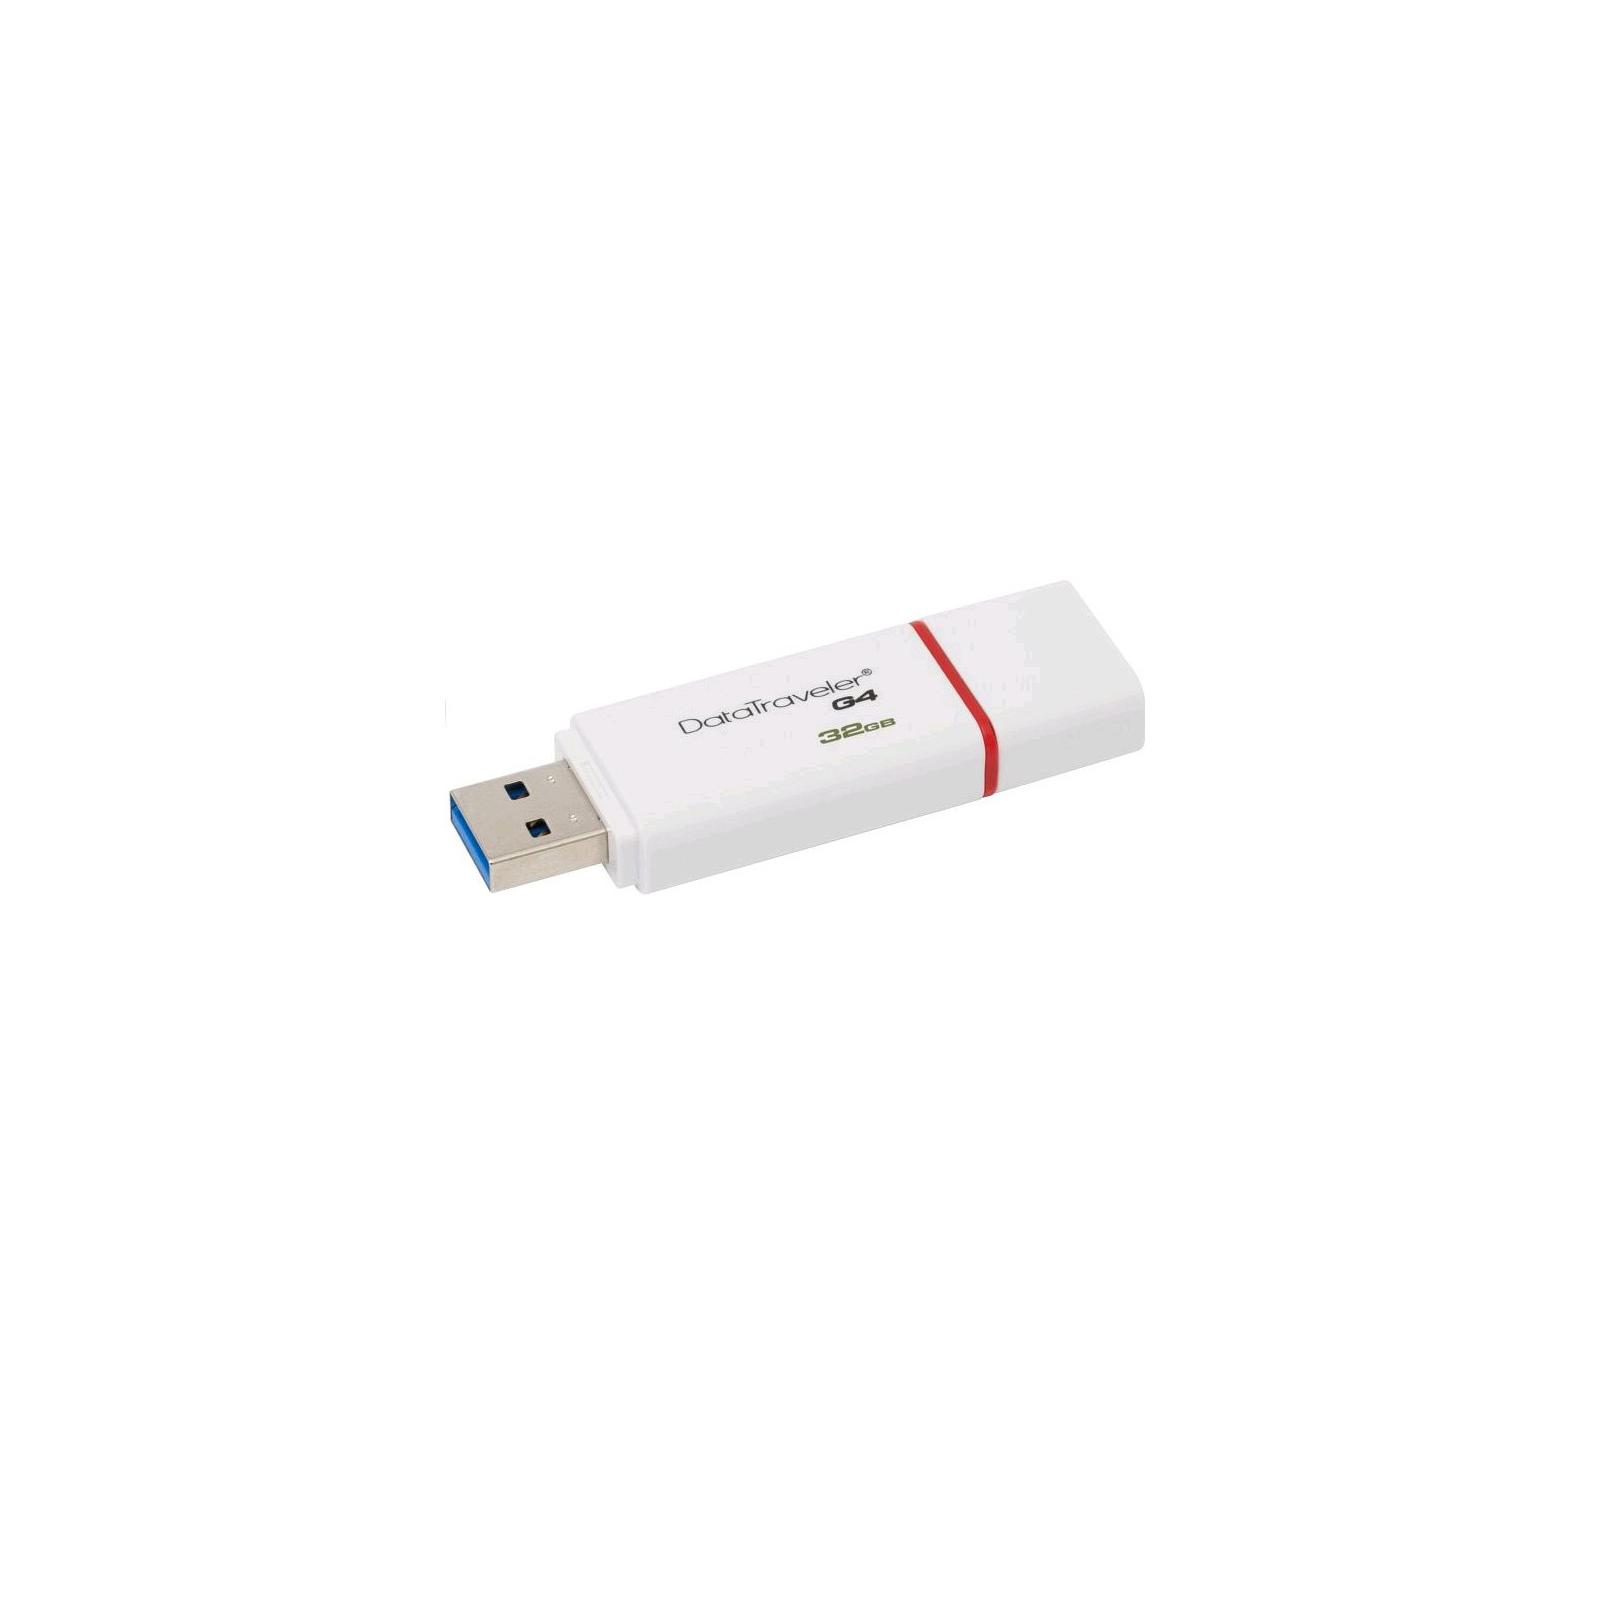 USB флеш накопитель Kingston 32Gb DataTraveler Generation 4 (DTIG4/32GB)